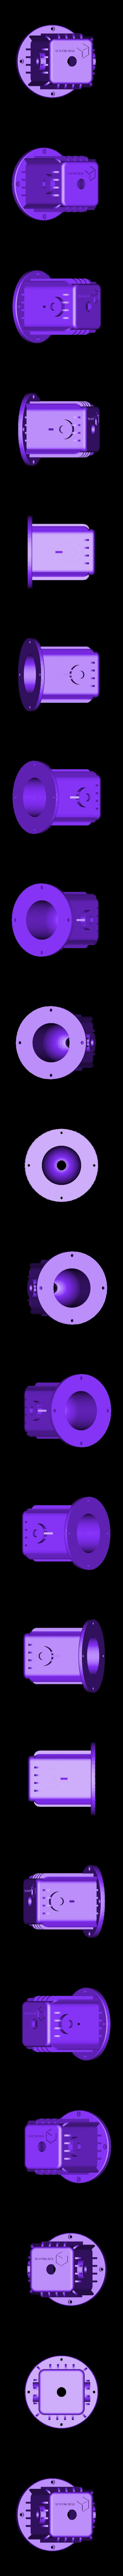 Upblock.stl Download free STL file Industrial Lamp - 3D printed • Object to 3D print, italymaker